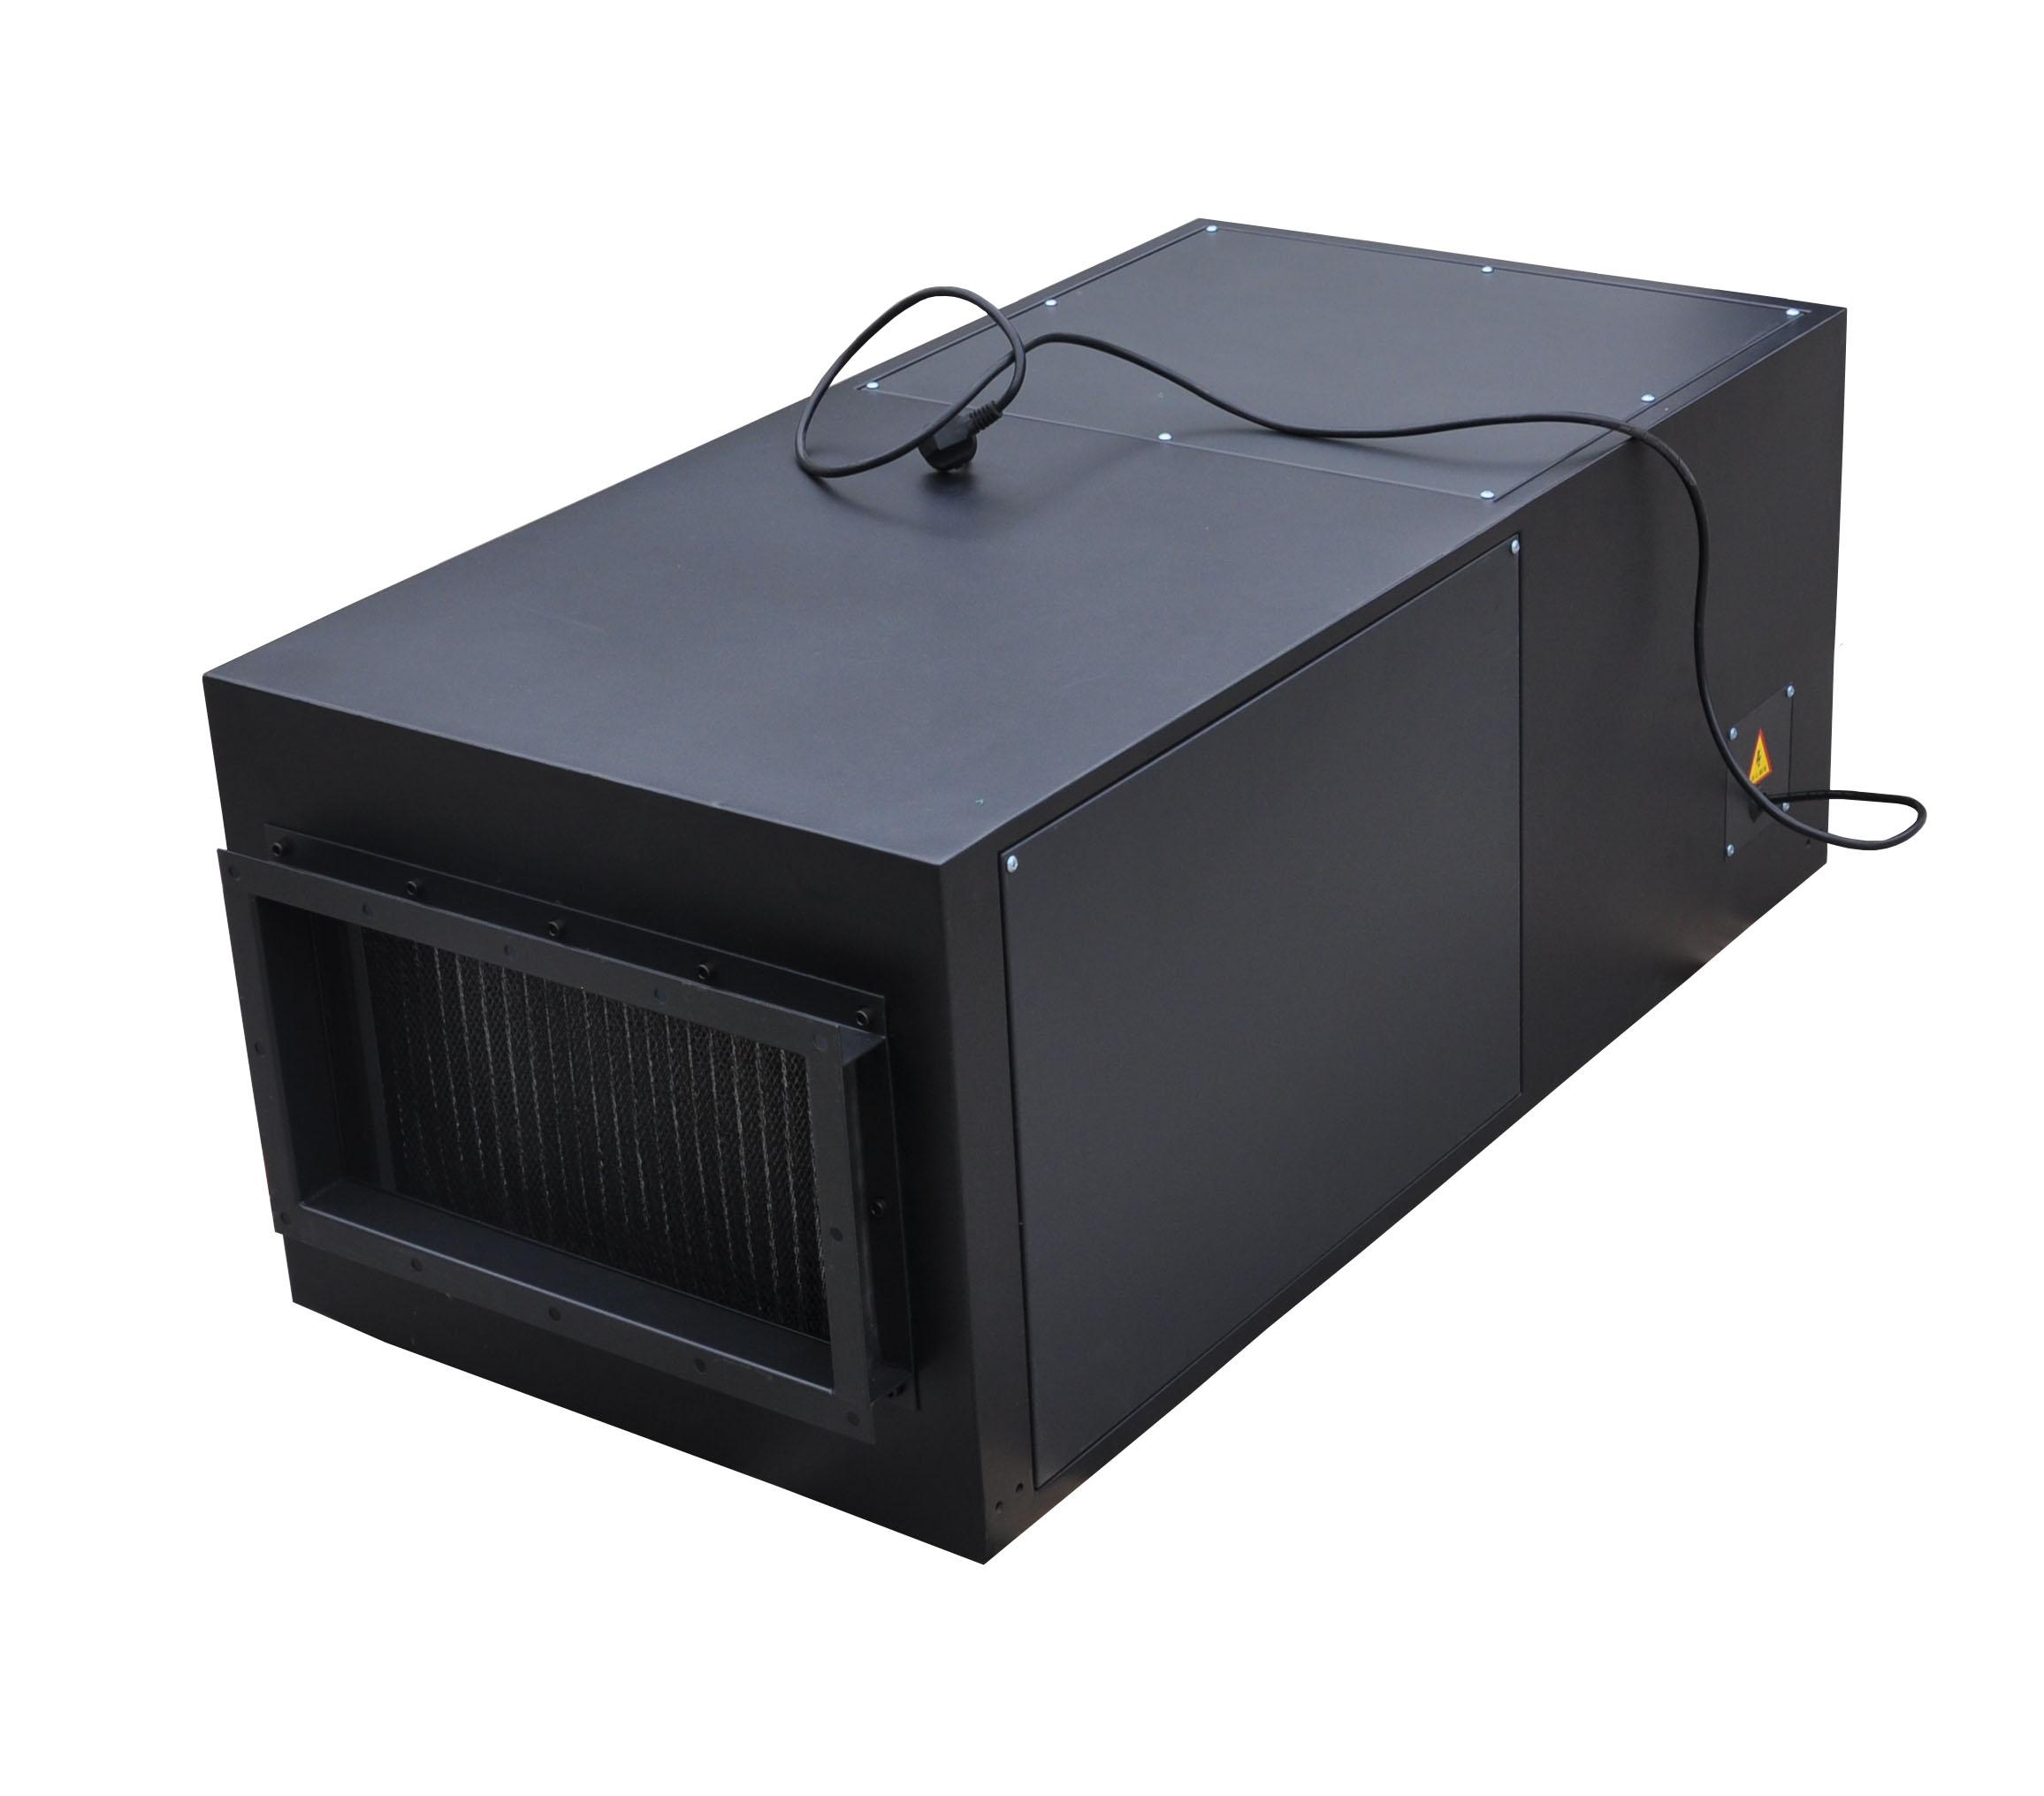 活性炭净化机 活性炭净化机 活性炭净化机 活性炭净化机